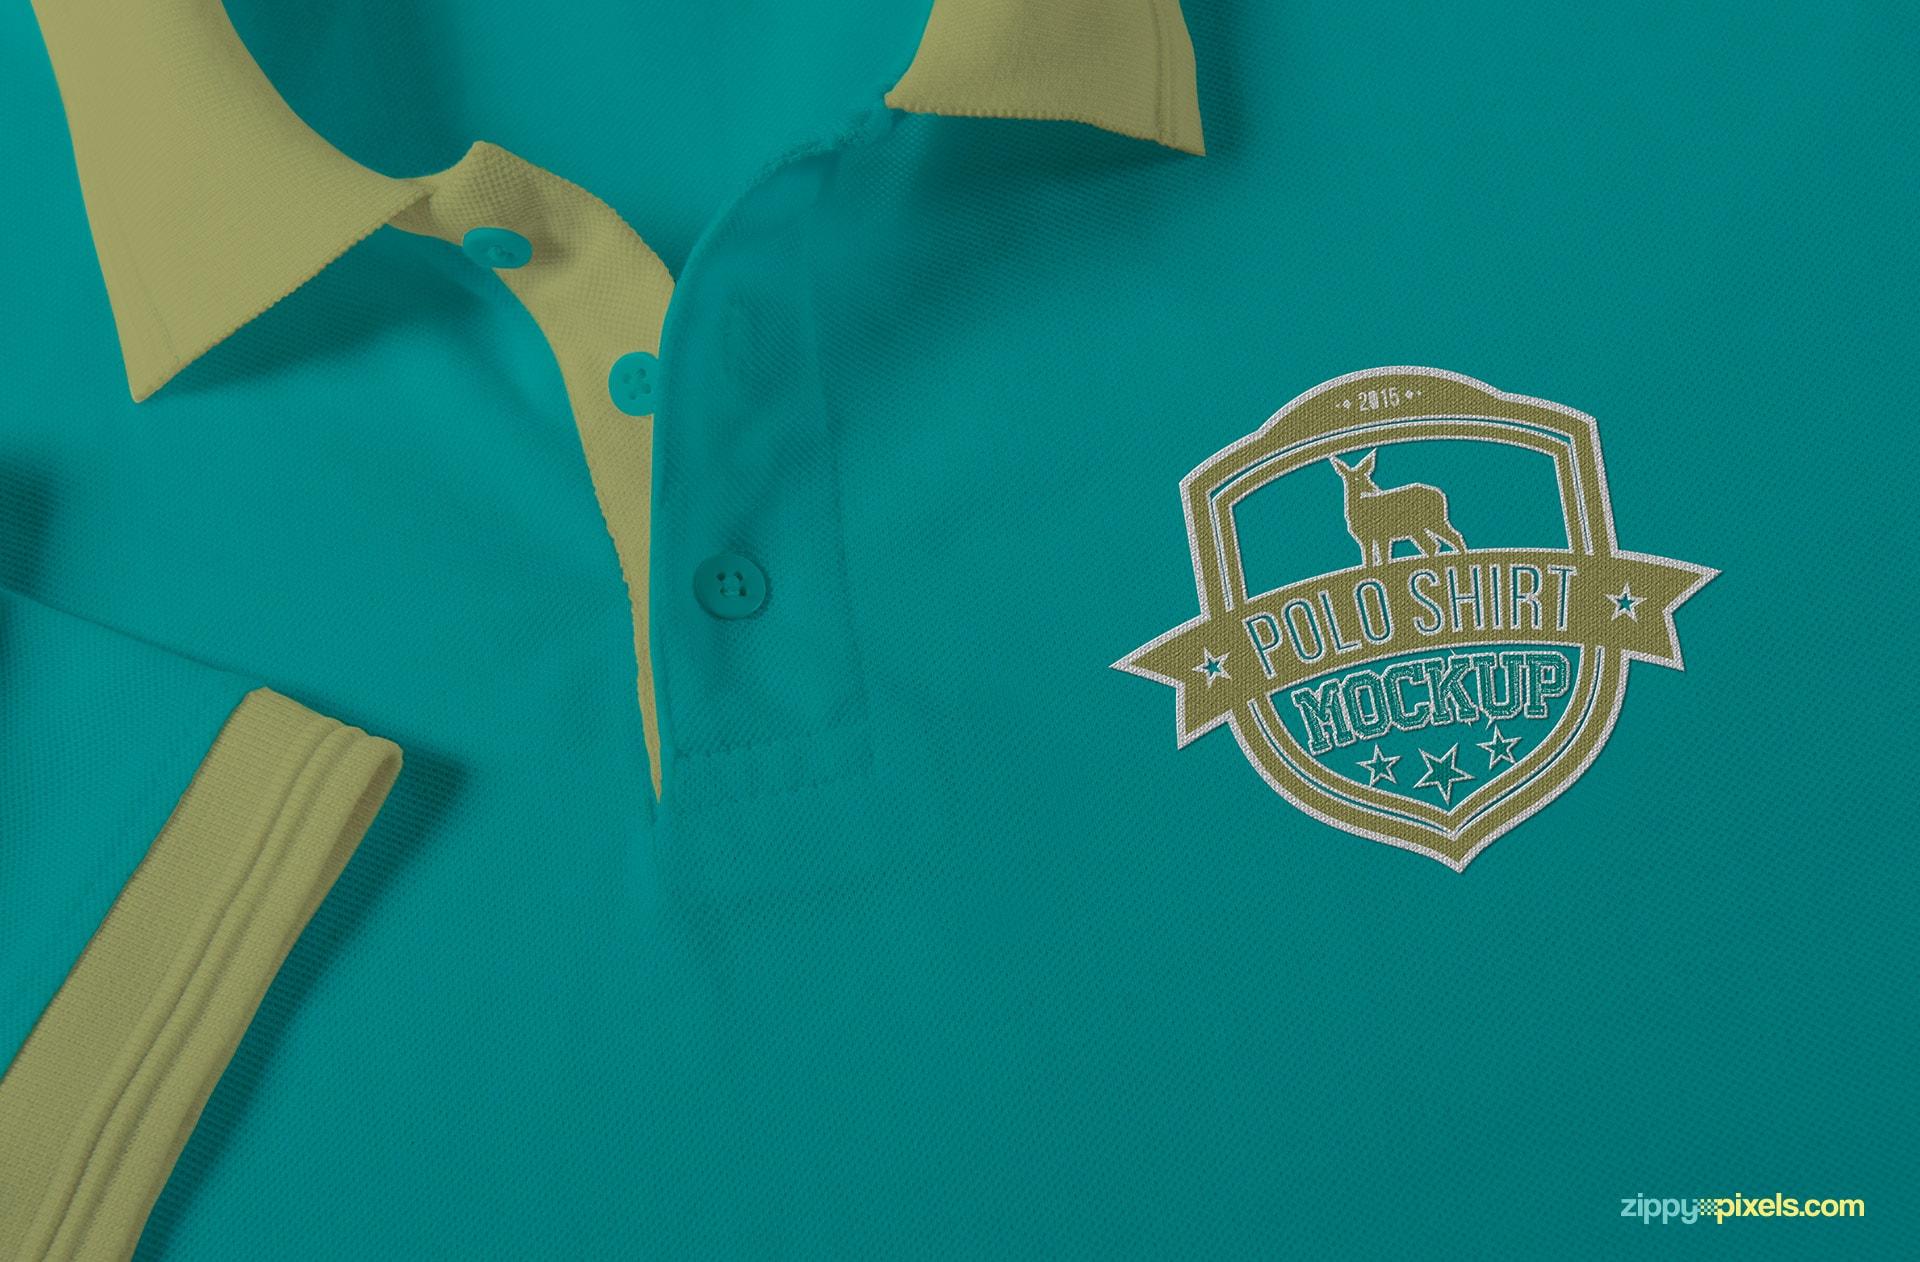 Polo shirt mockup PSD with customization options